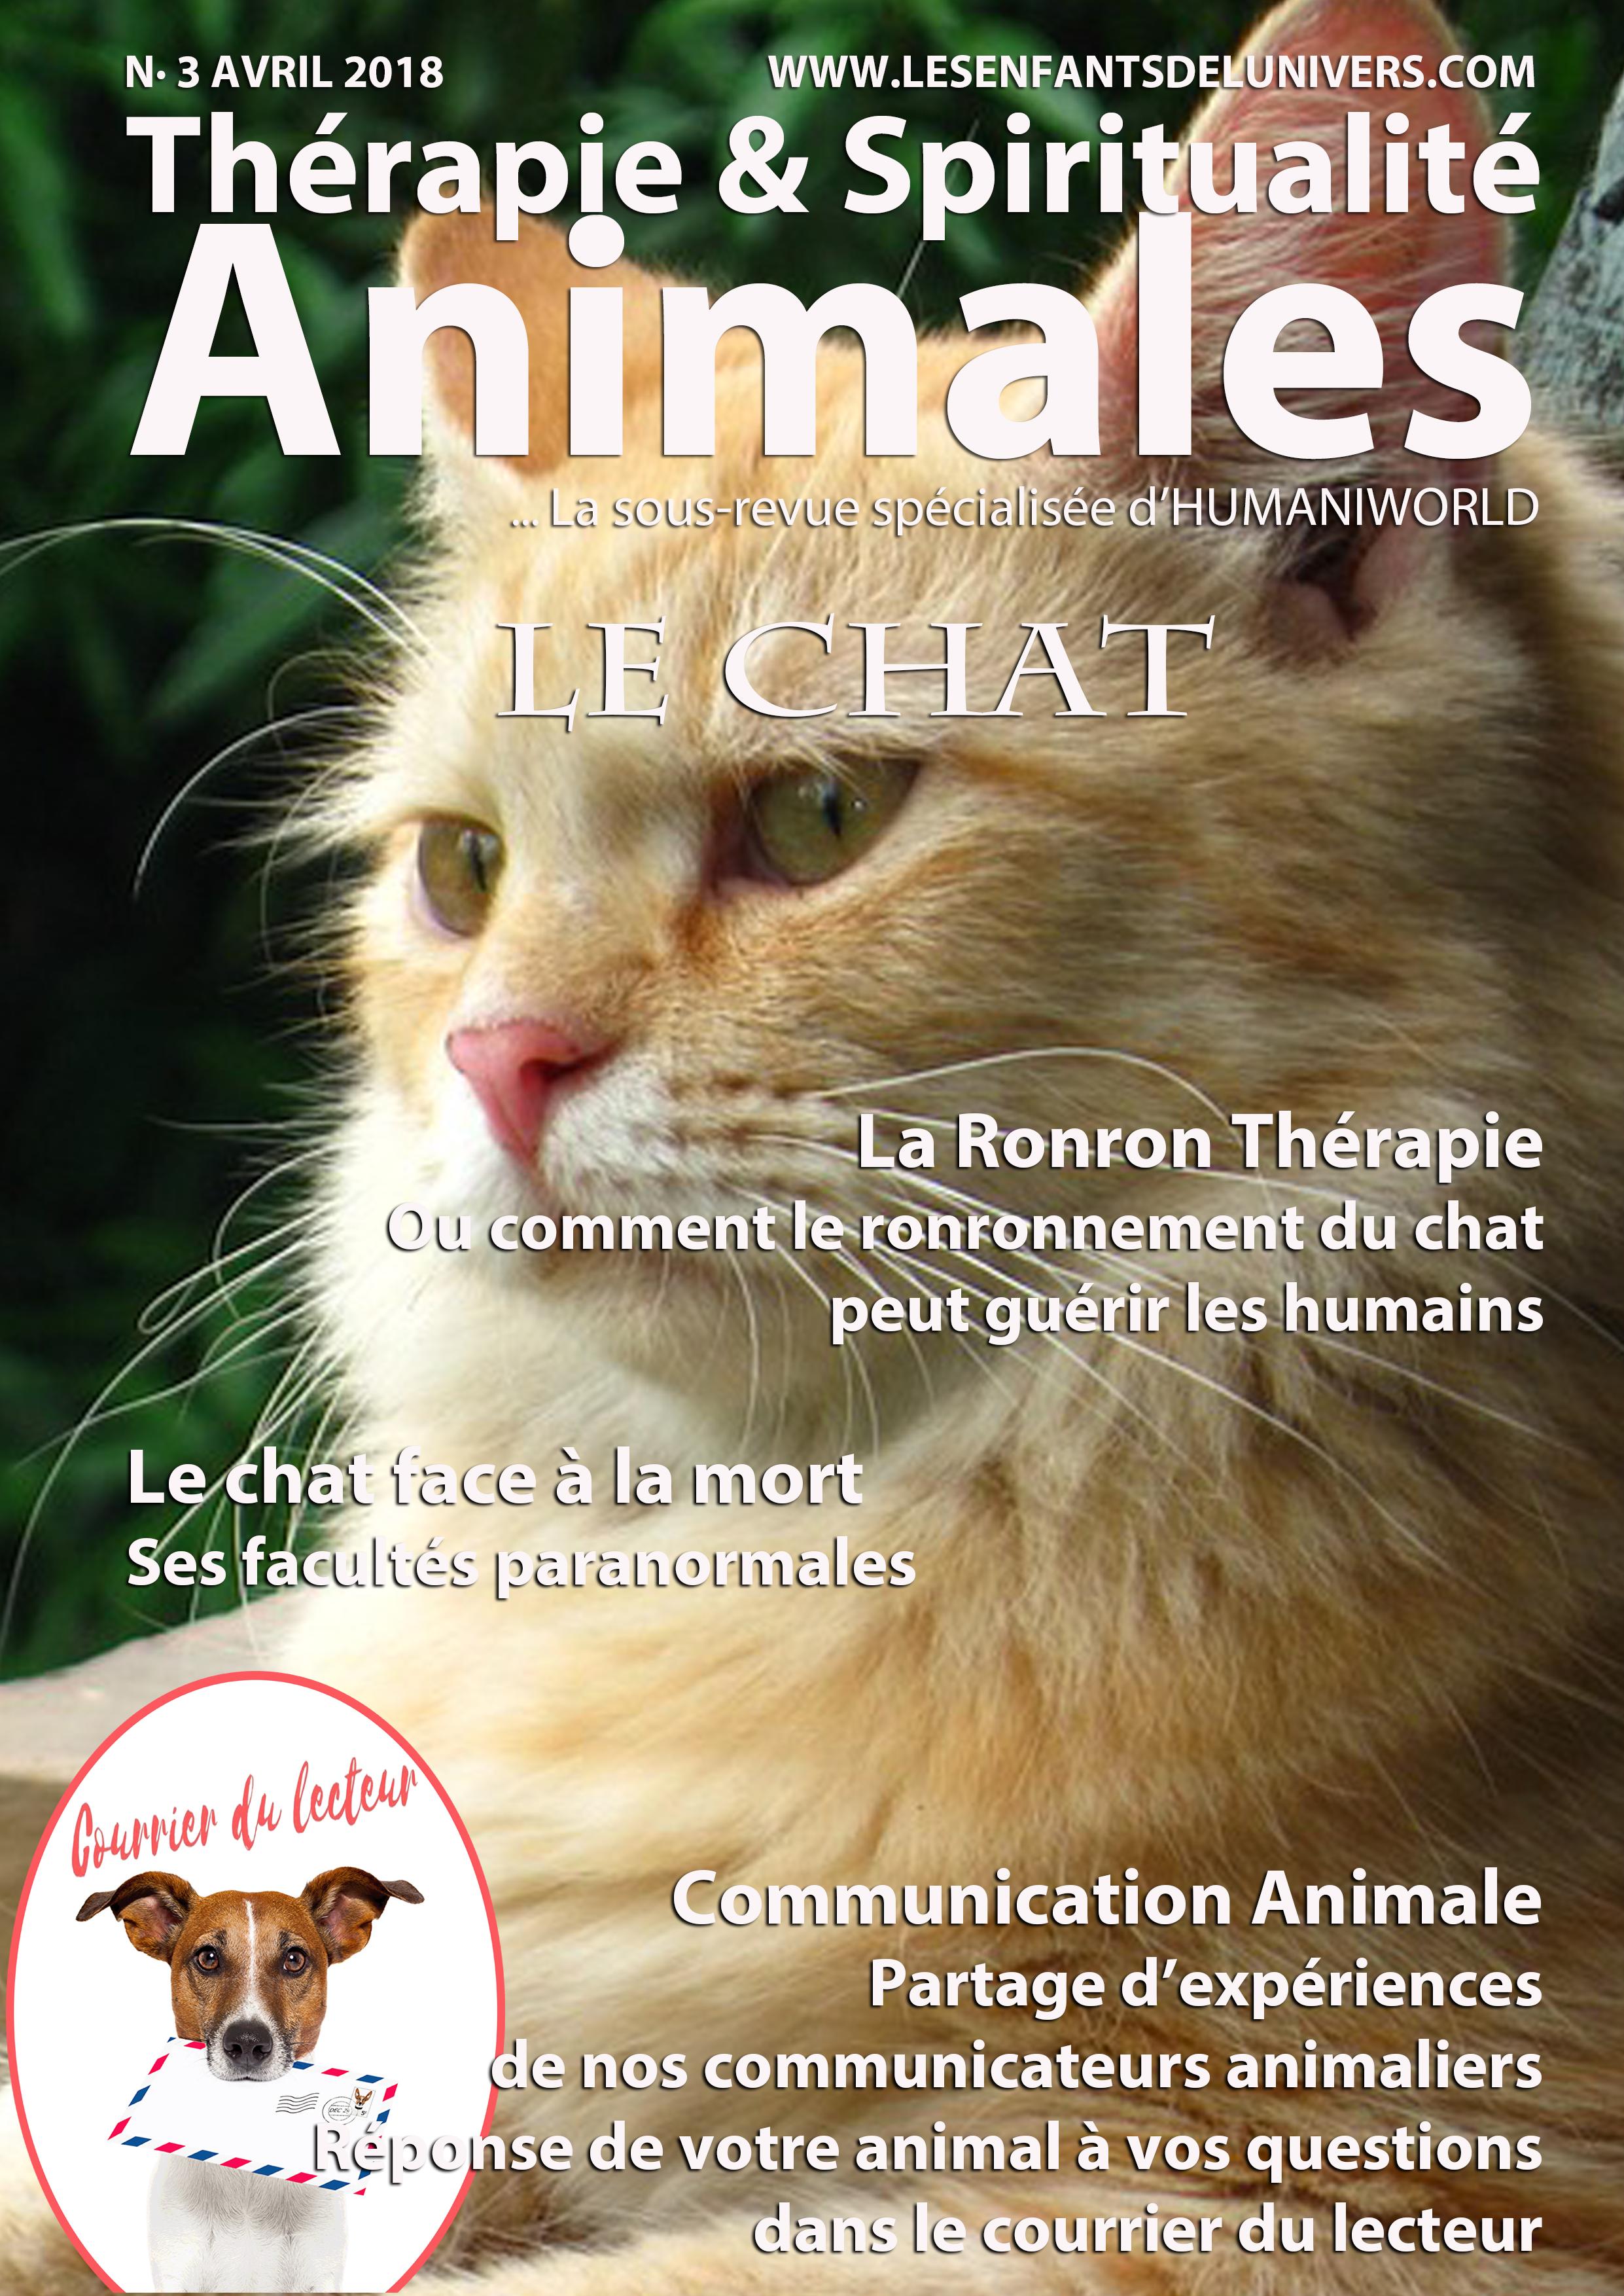 Thérapie & Spiritualité Animales N°3